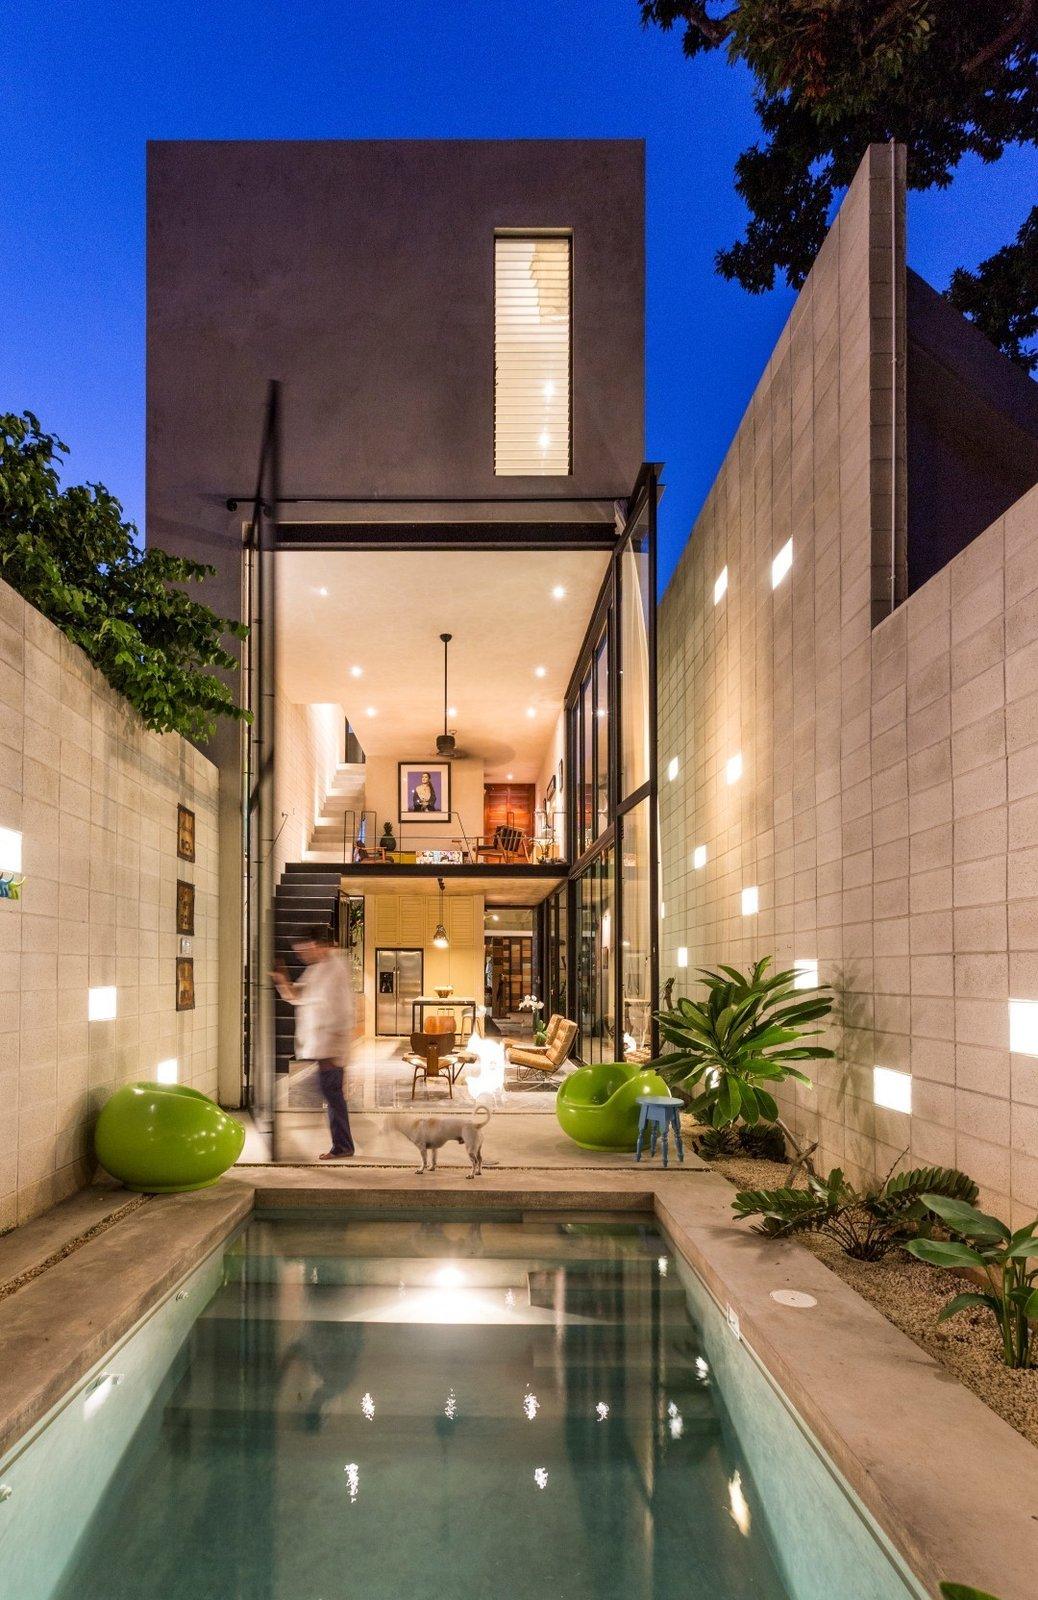 #pool #pooldesign #outdoor #exterior #modern #modernarchitecture #minimal #narrow #Mérida #Mexico #TallerEstiloArquitectura   Backyard Daydream from Small Pool Ideas